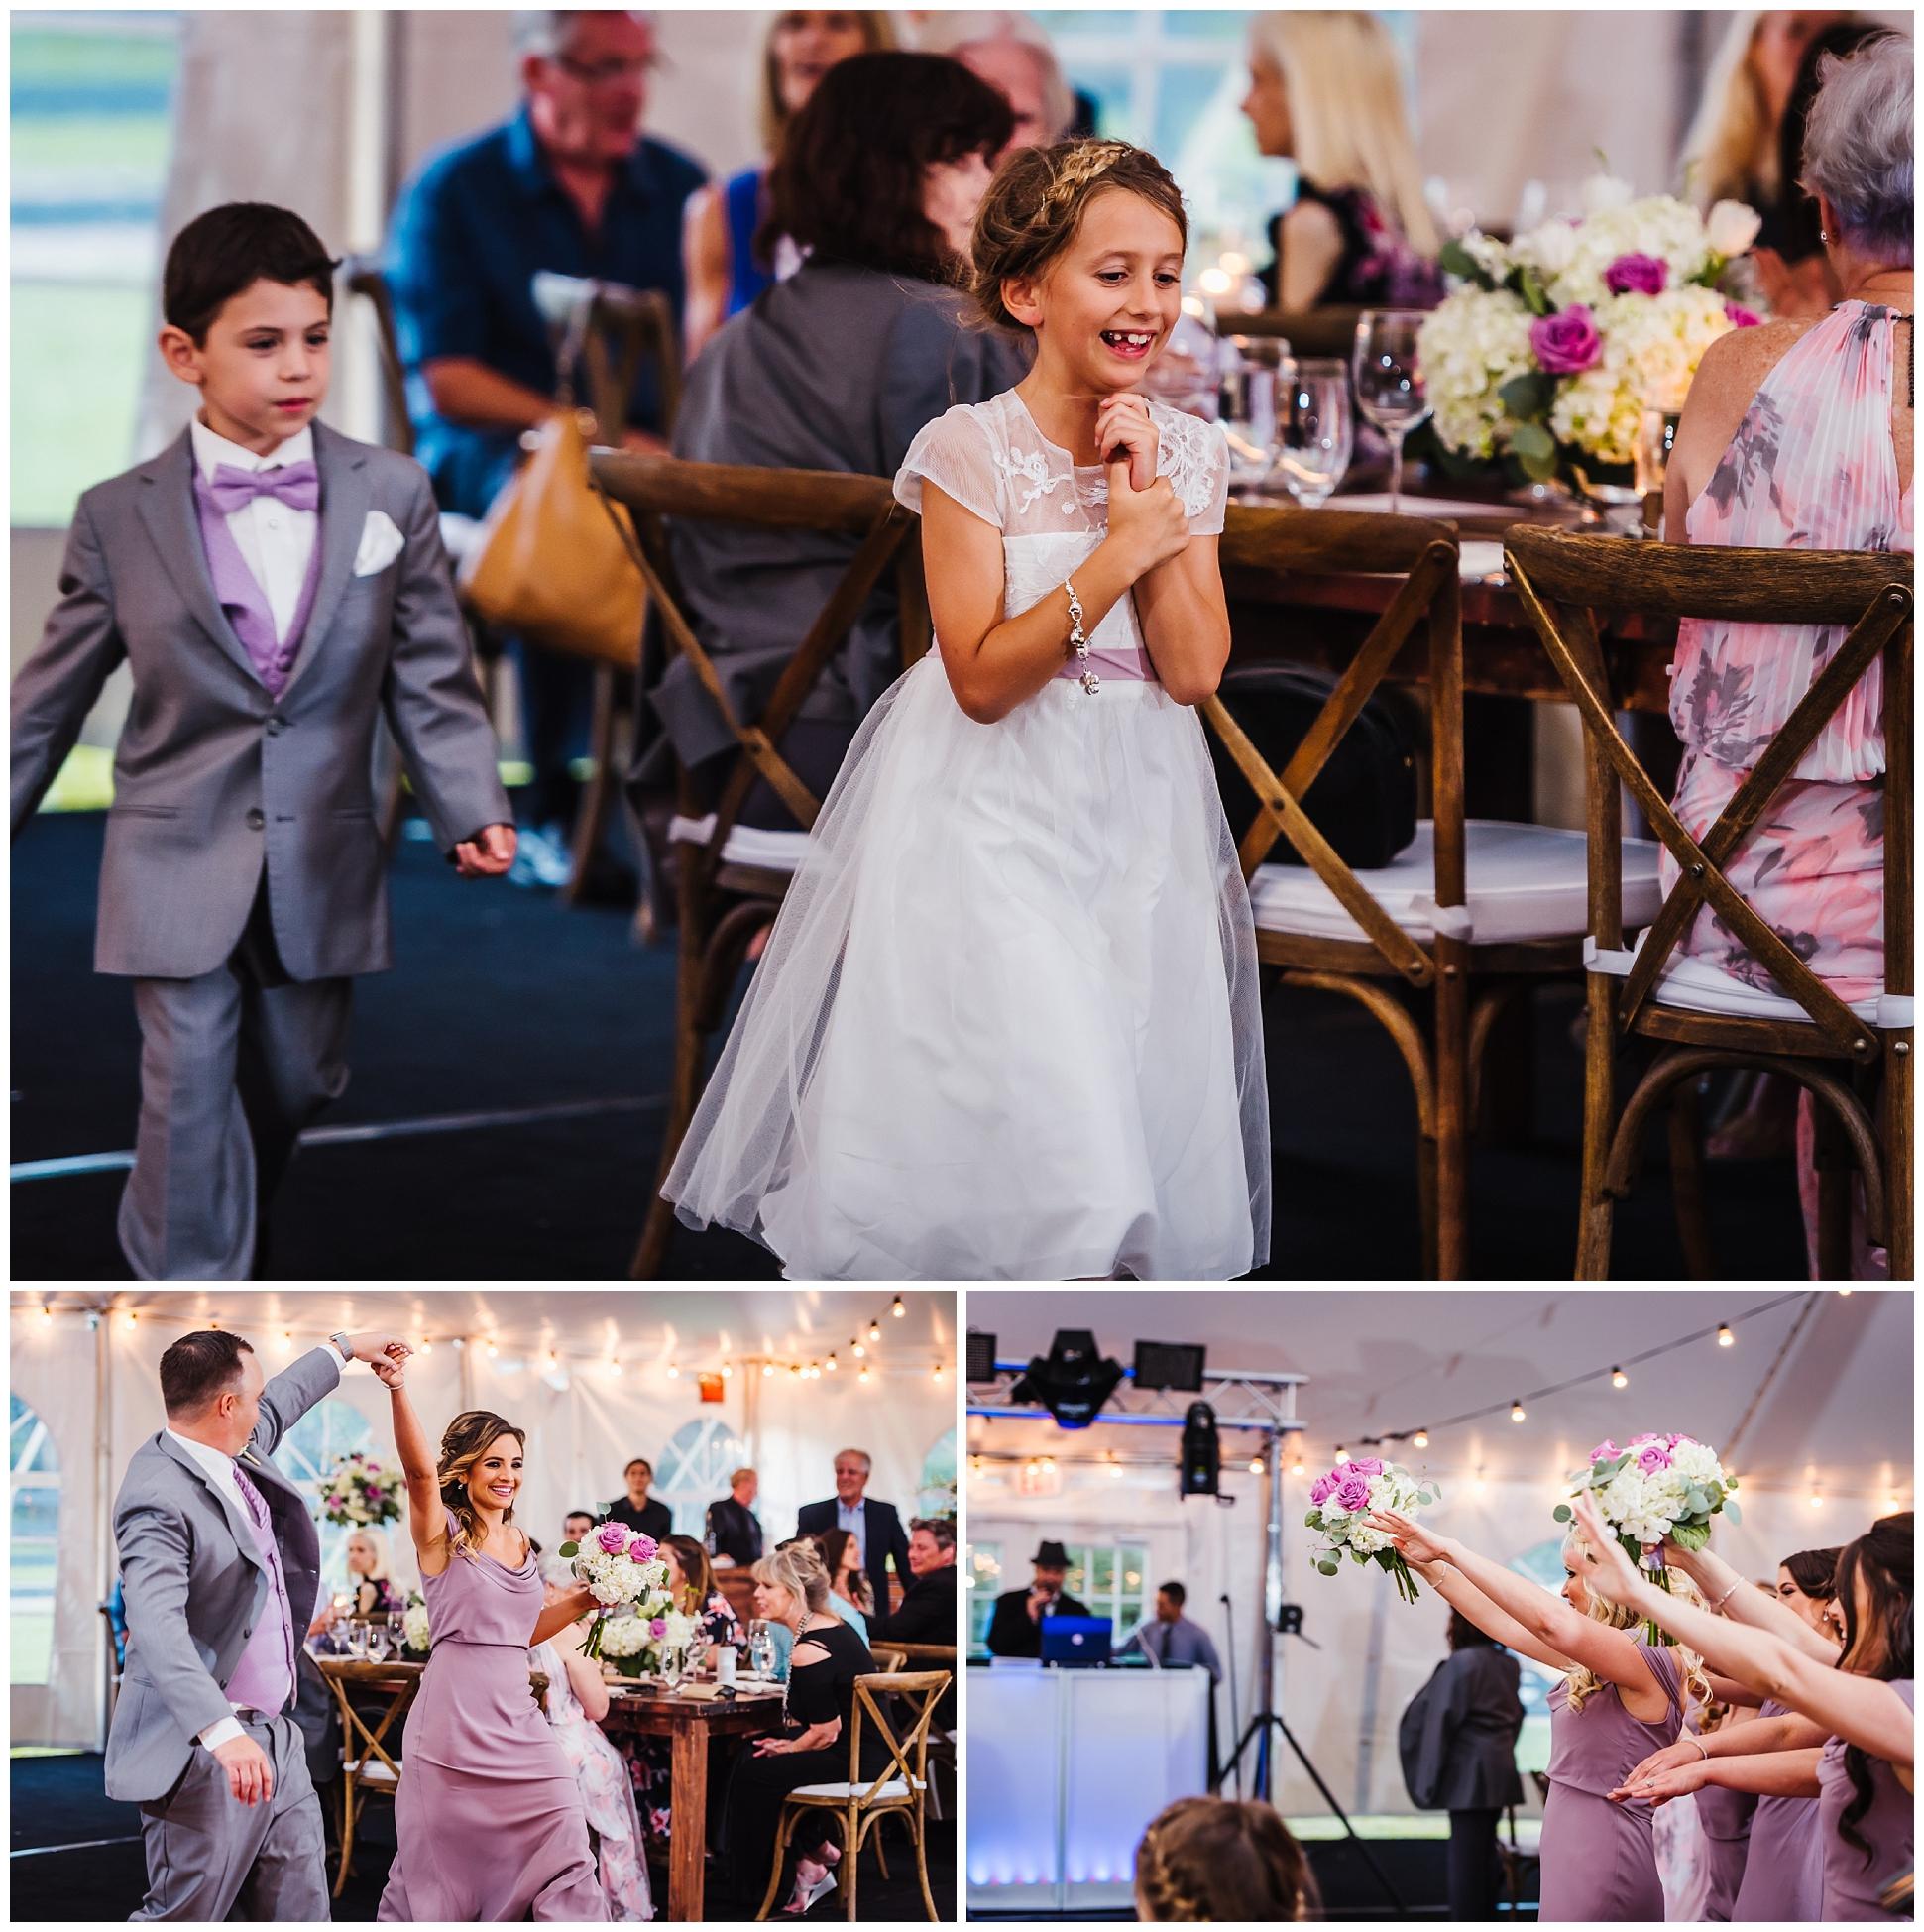 Tampa-luxury-wedding-photographer-mision-lago-private-estate_0050.jpg